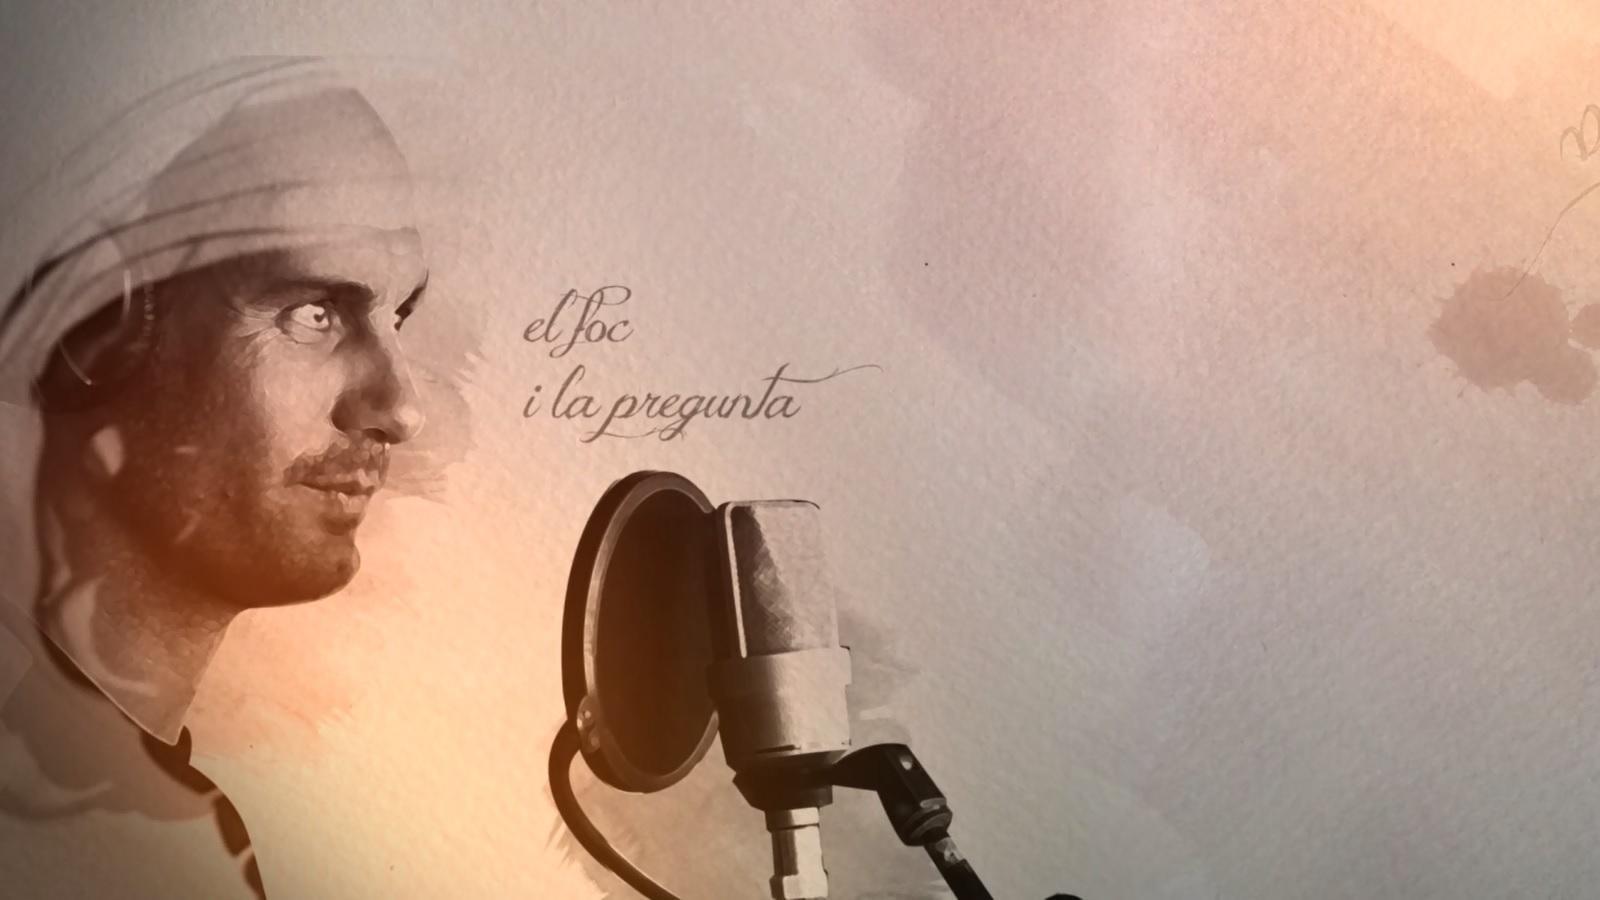 'L'hoste insòlit', de Martí i Pol, musicat per Mokodude i Pep Guardiola